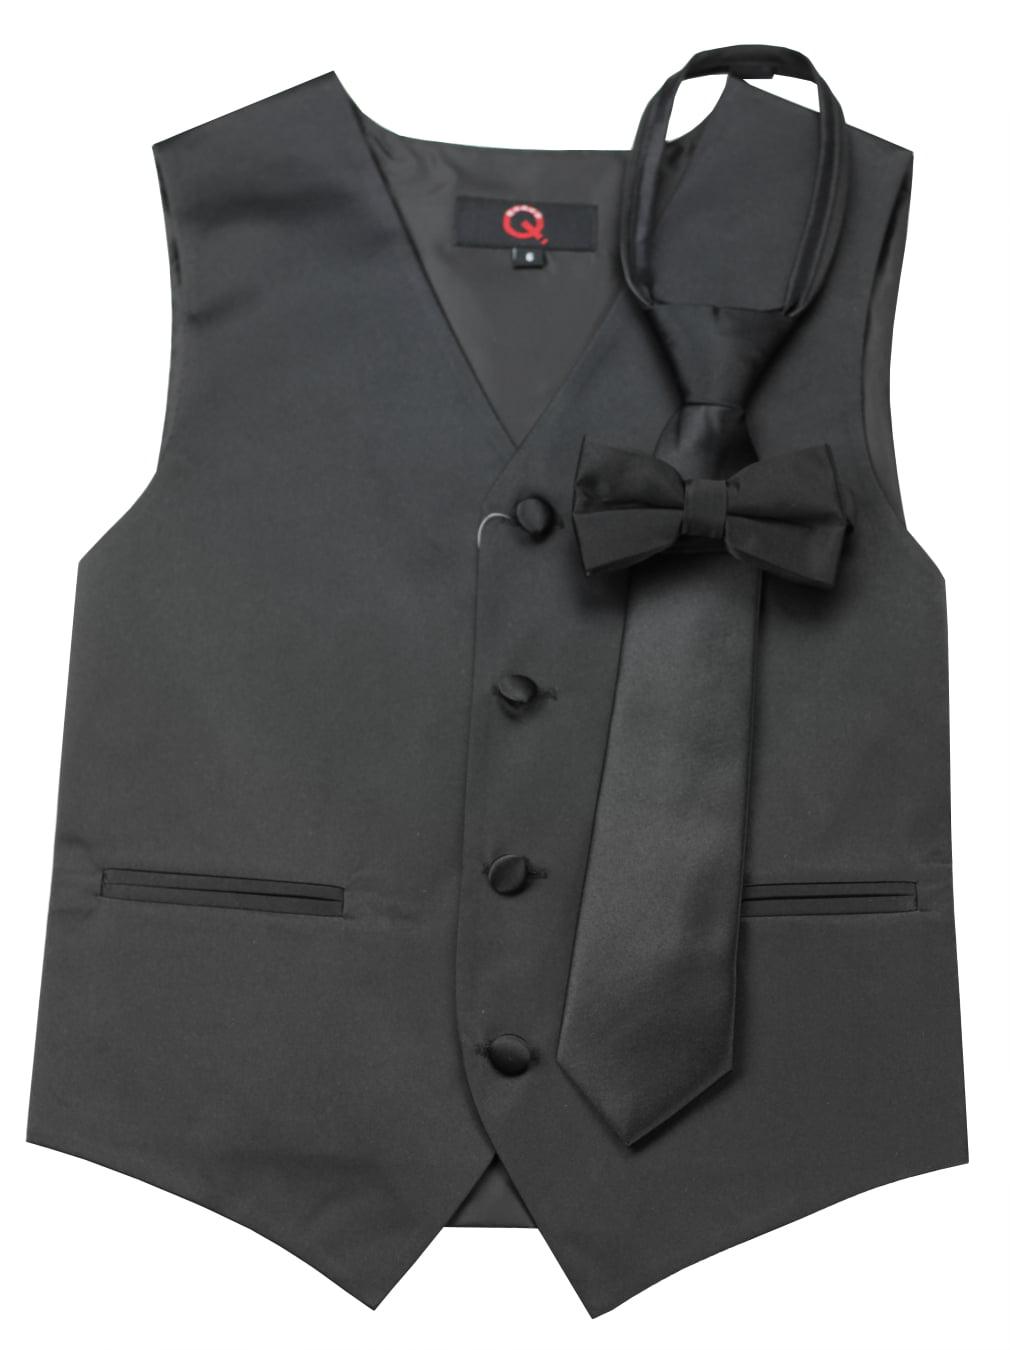 Brand Q Boys Tuxedo Vest Zipper Tie /& Bow-Tie Set in Scarlet